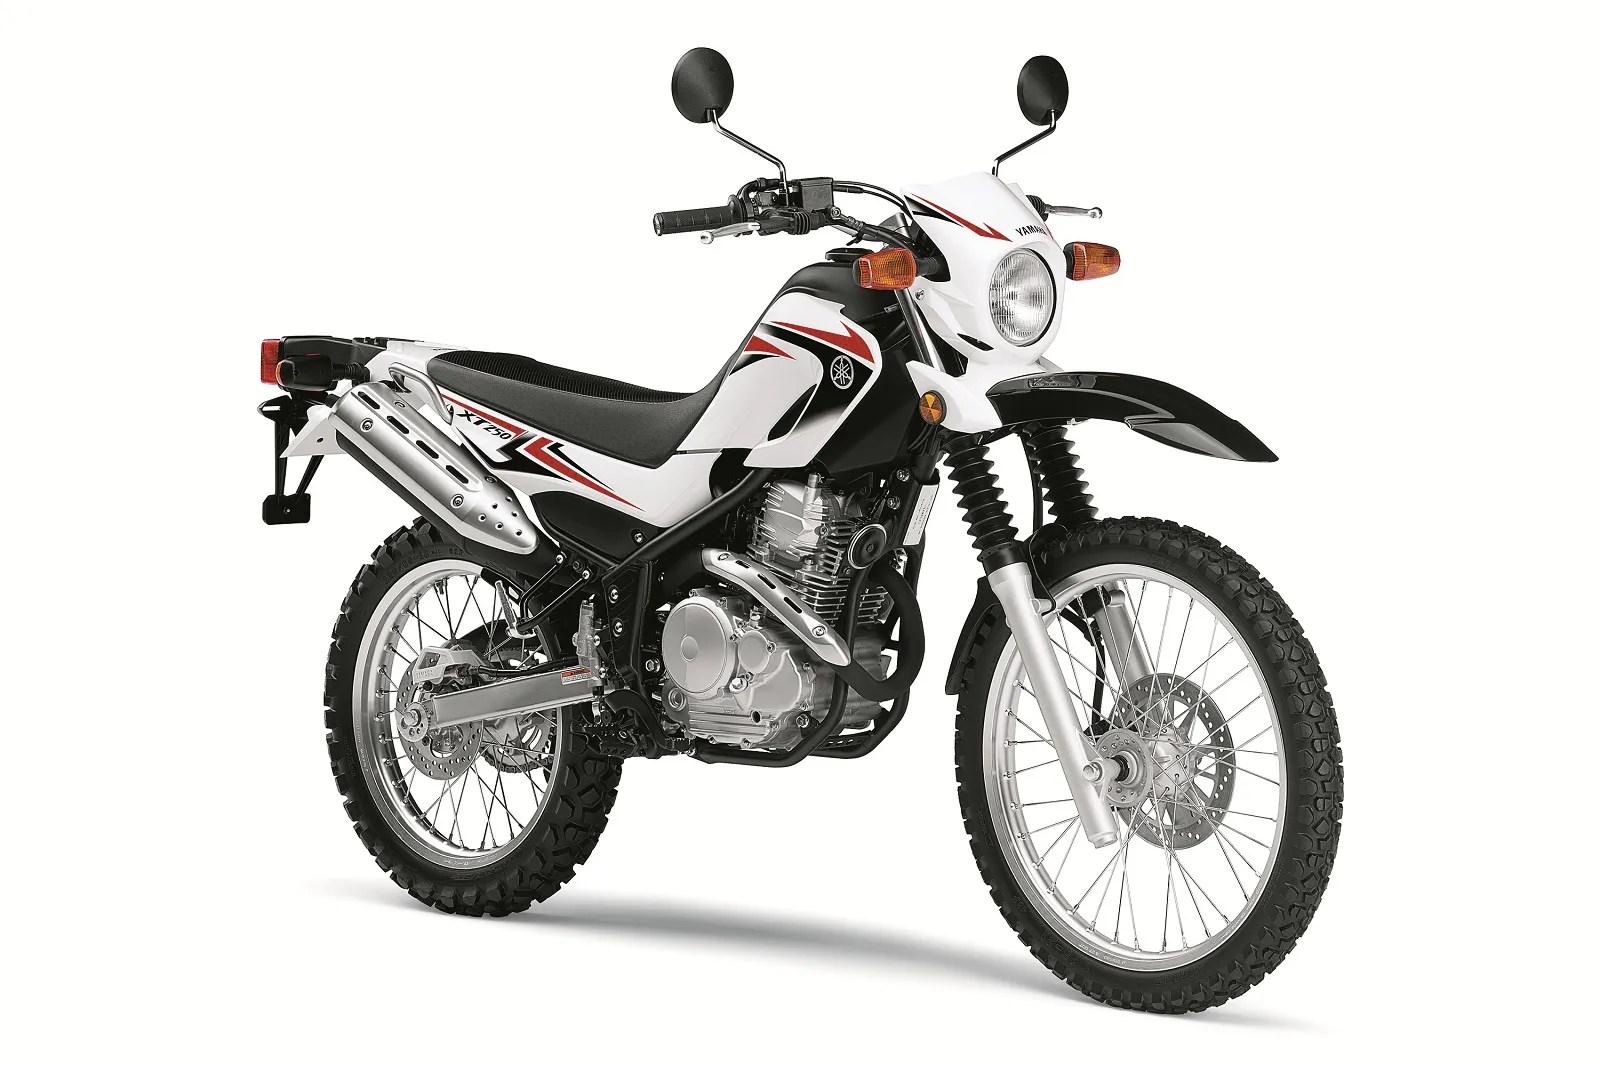 2008 YAMAHA VIRAGO 250 V STAR 250 MOTORCYCLE SERVICE